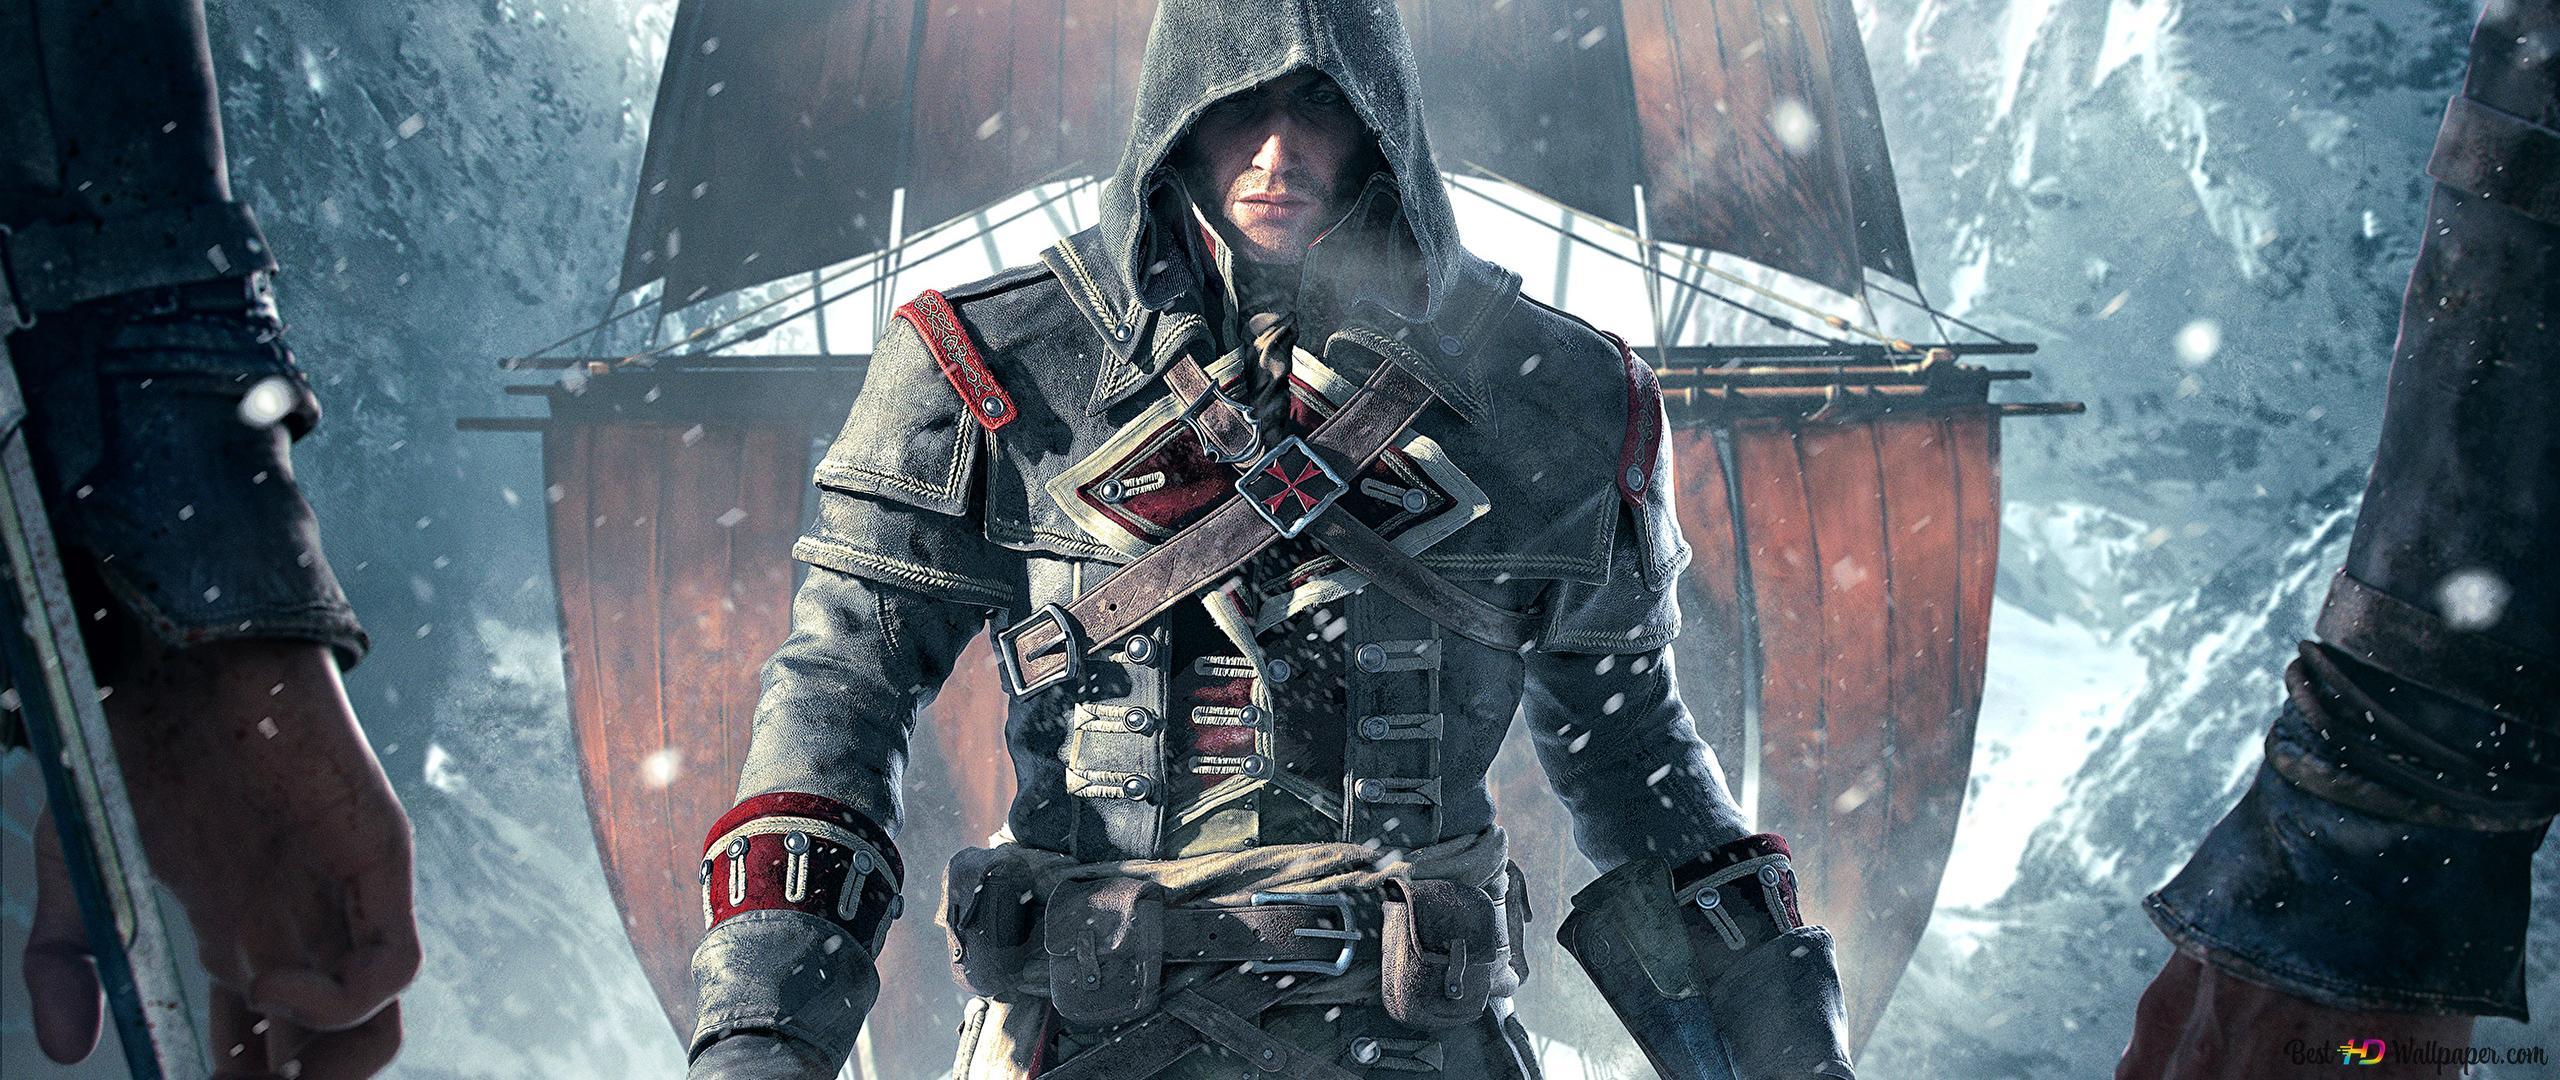 Assassin S Creed 4 Black Flag Shay Patrick Cormac Hd Wallpaper Download